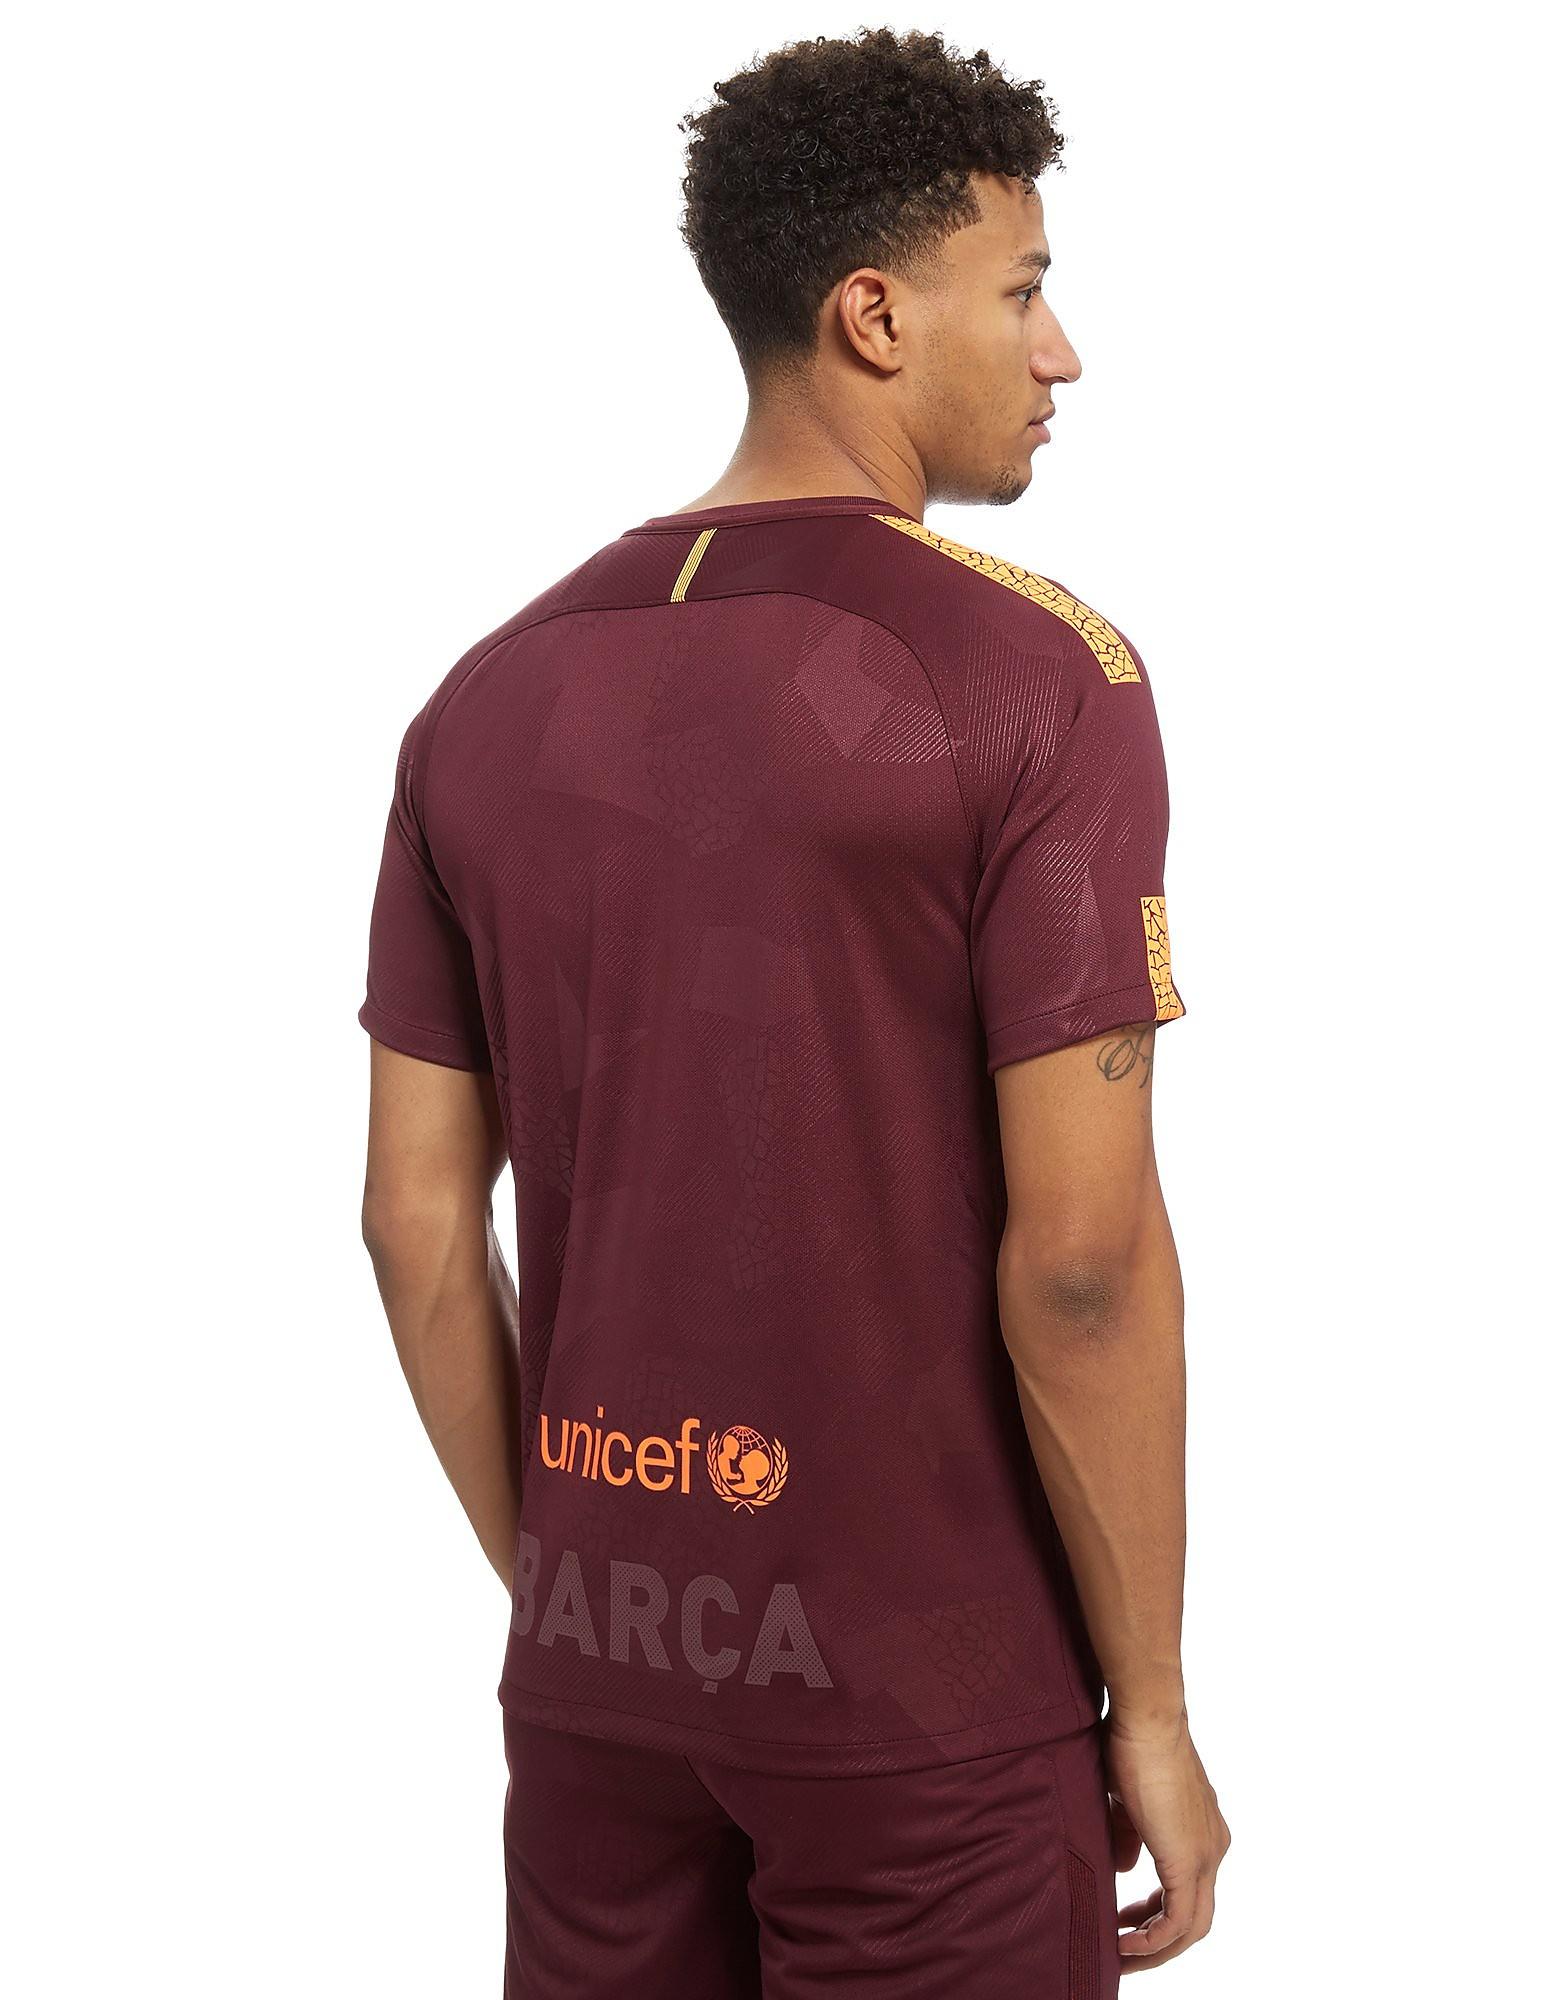 Nike FC Barcelona 2017/18 Third Shirt Homme